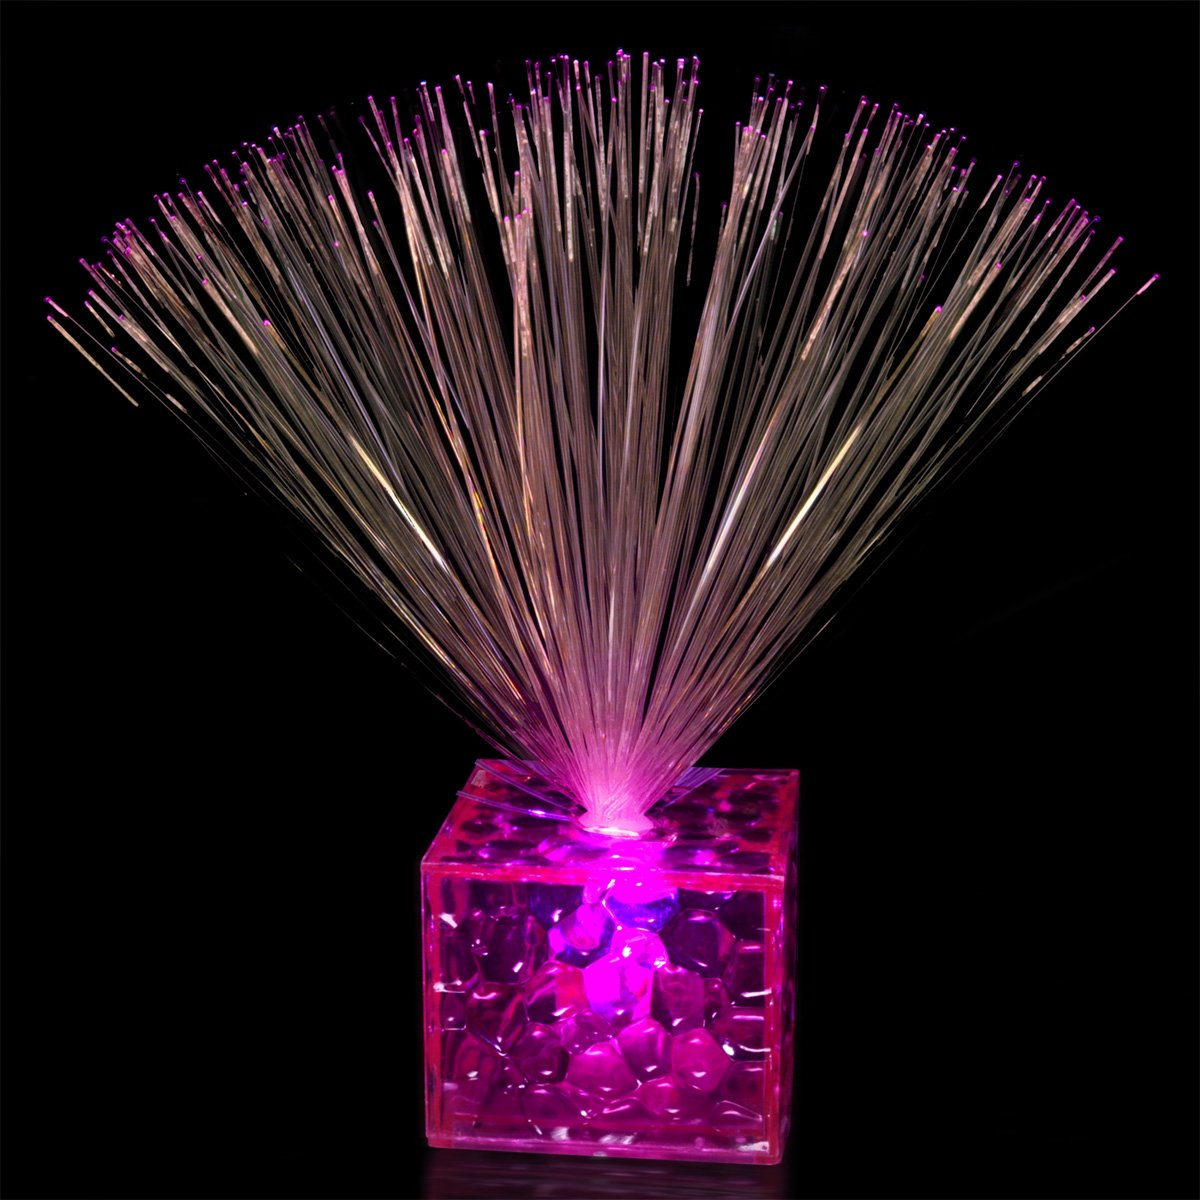 5.5 Light Up Small Pink Fiber Optic Centerpiece m29504 14 4151 [ fiber optic connectors 26 up start 3 wks aro ]